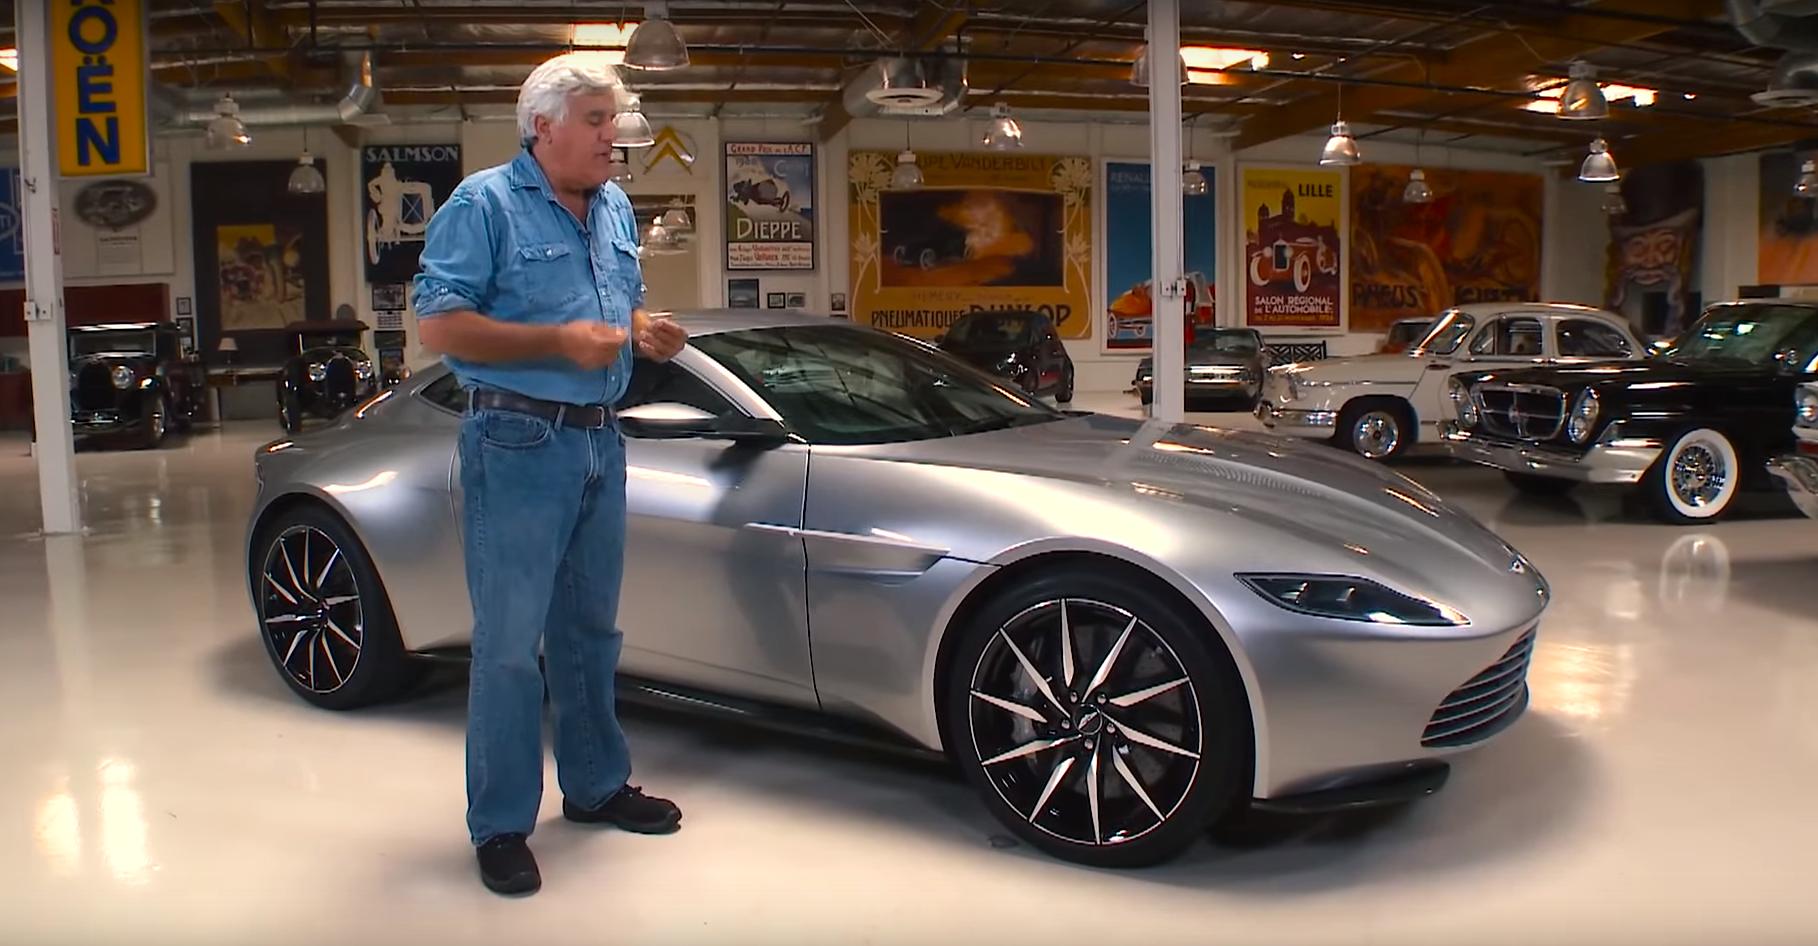 Jay Leno Drives The Aston Martin Db10 From Spectre The